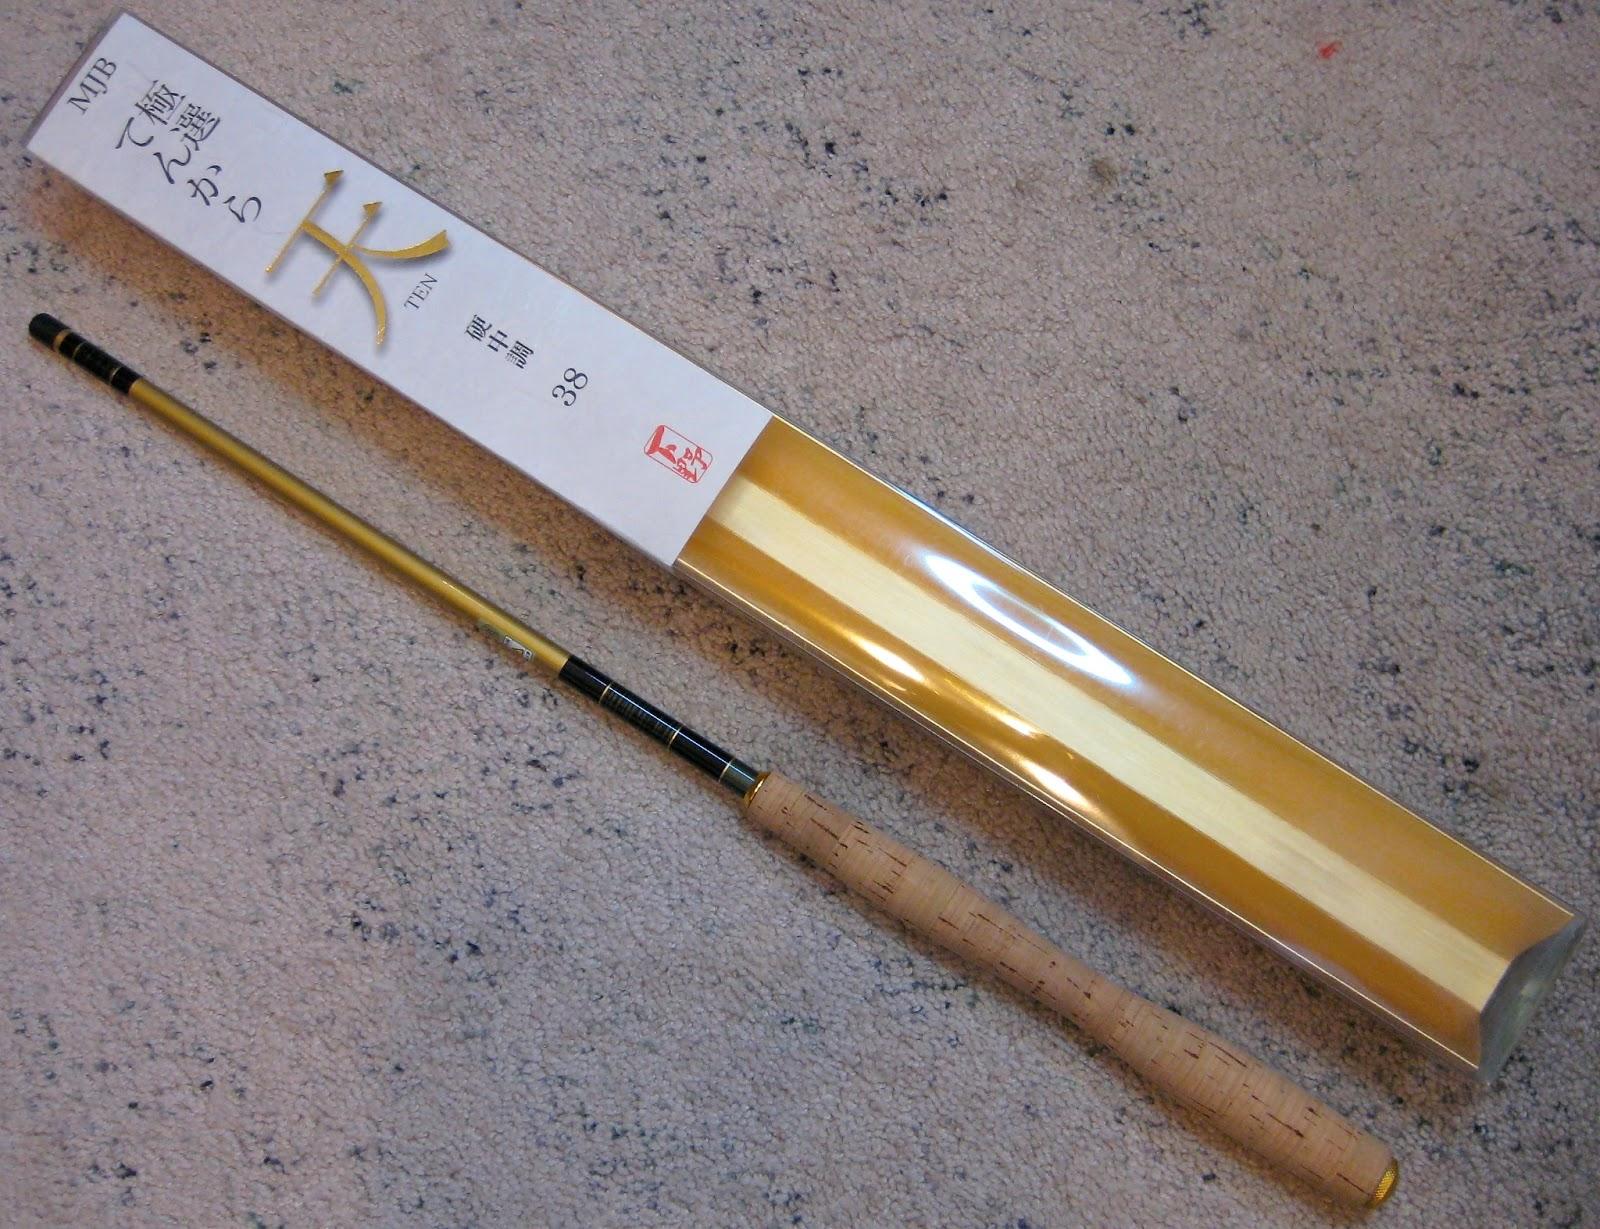 Teton tenkara shimotsuke ten tenkara rod review for Tenkara fishing rods